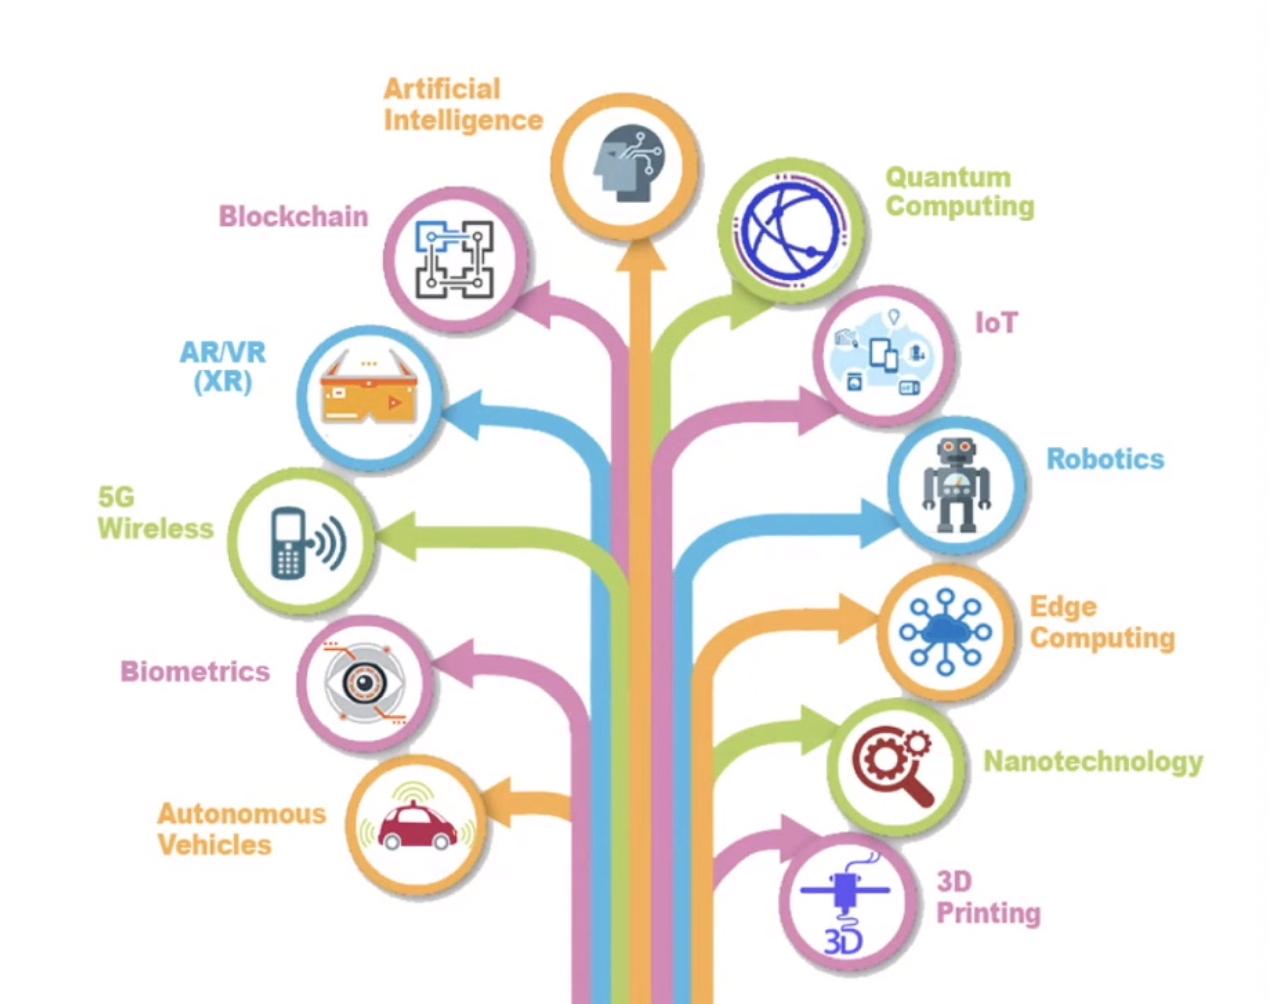 Arbre des technologies (technology tree)